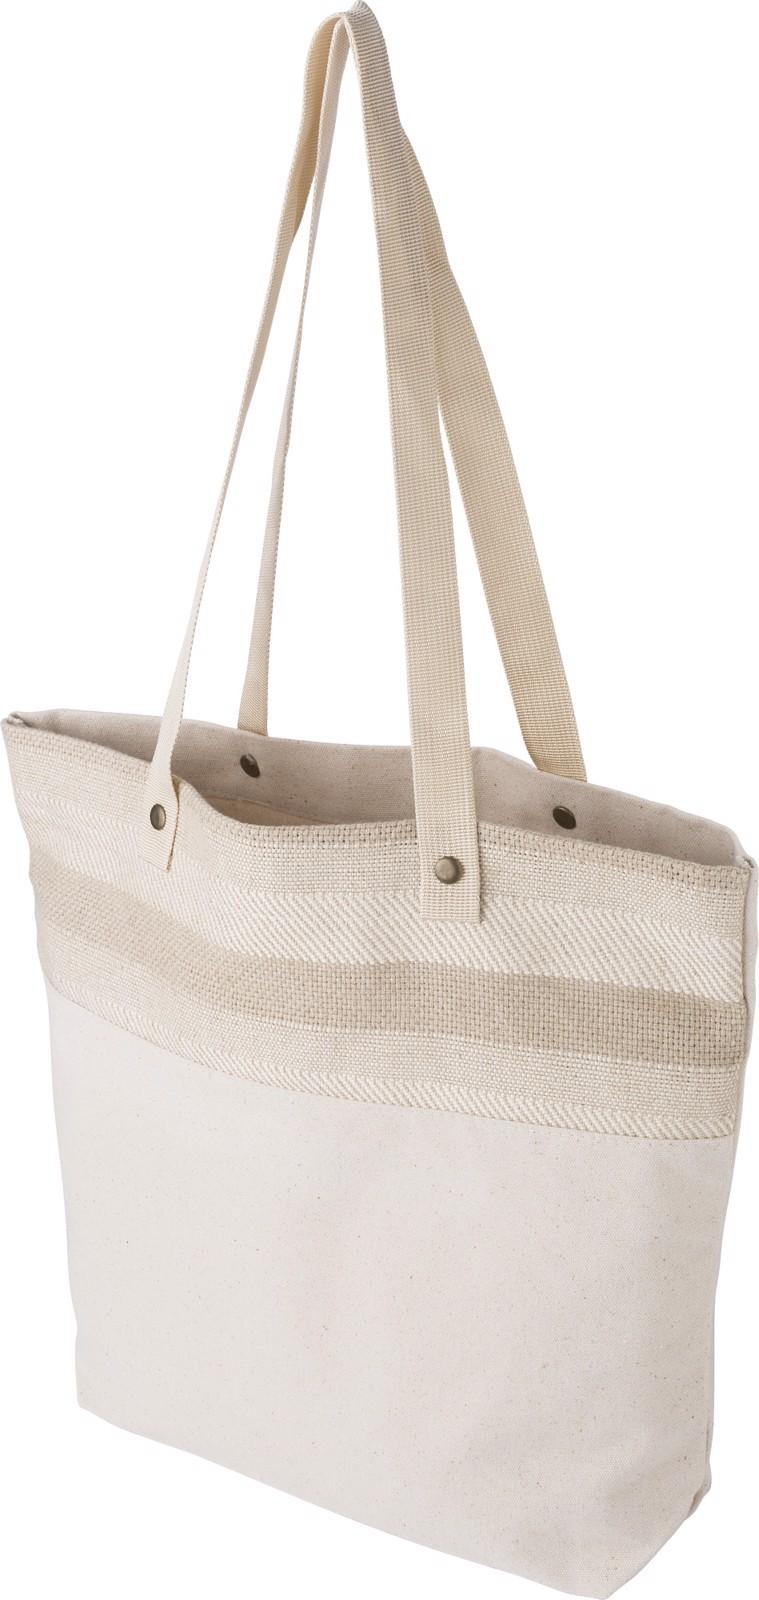 Cotton (380 gr/m²) shopping bag